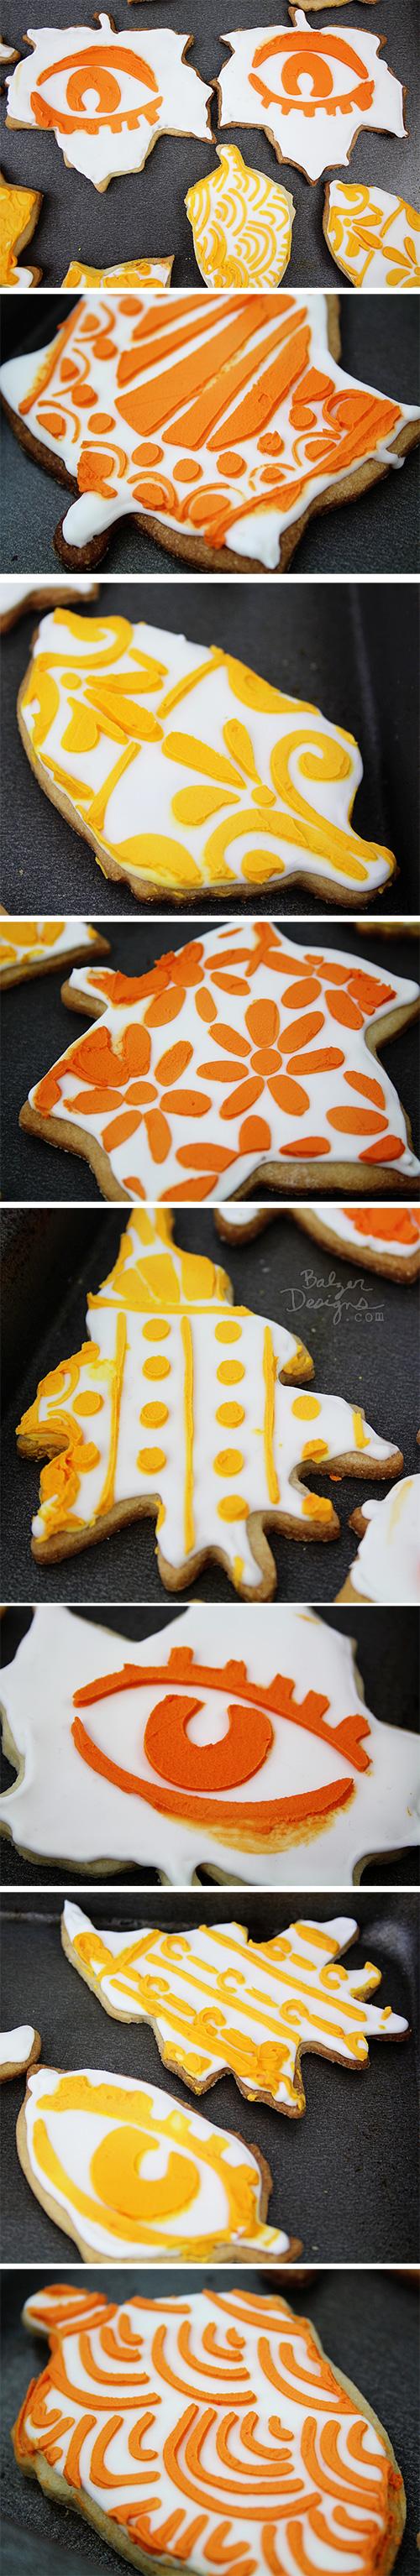 CookiesCloseUp-wm